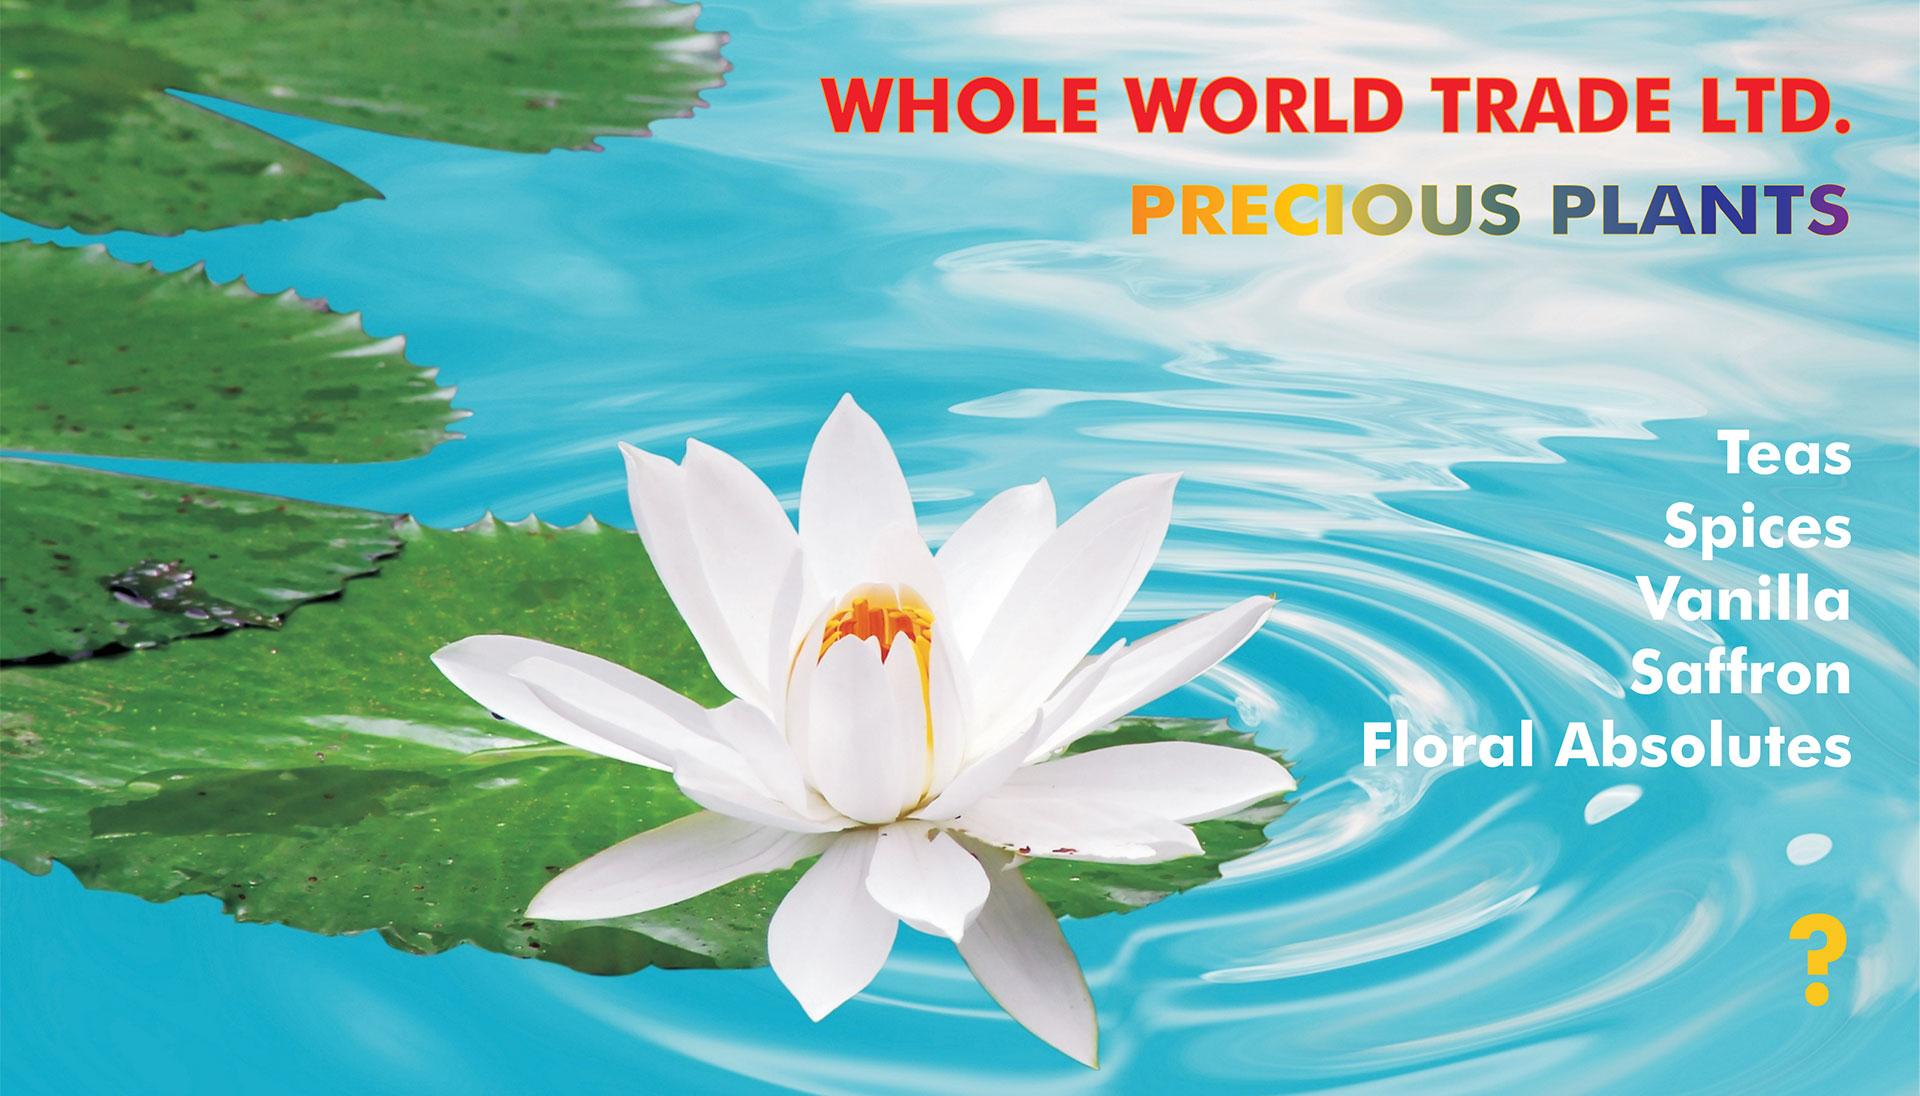 Whole World Trade Ltd. precious plants, teas, spices, vanilla, saffron, and floral absolutes.